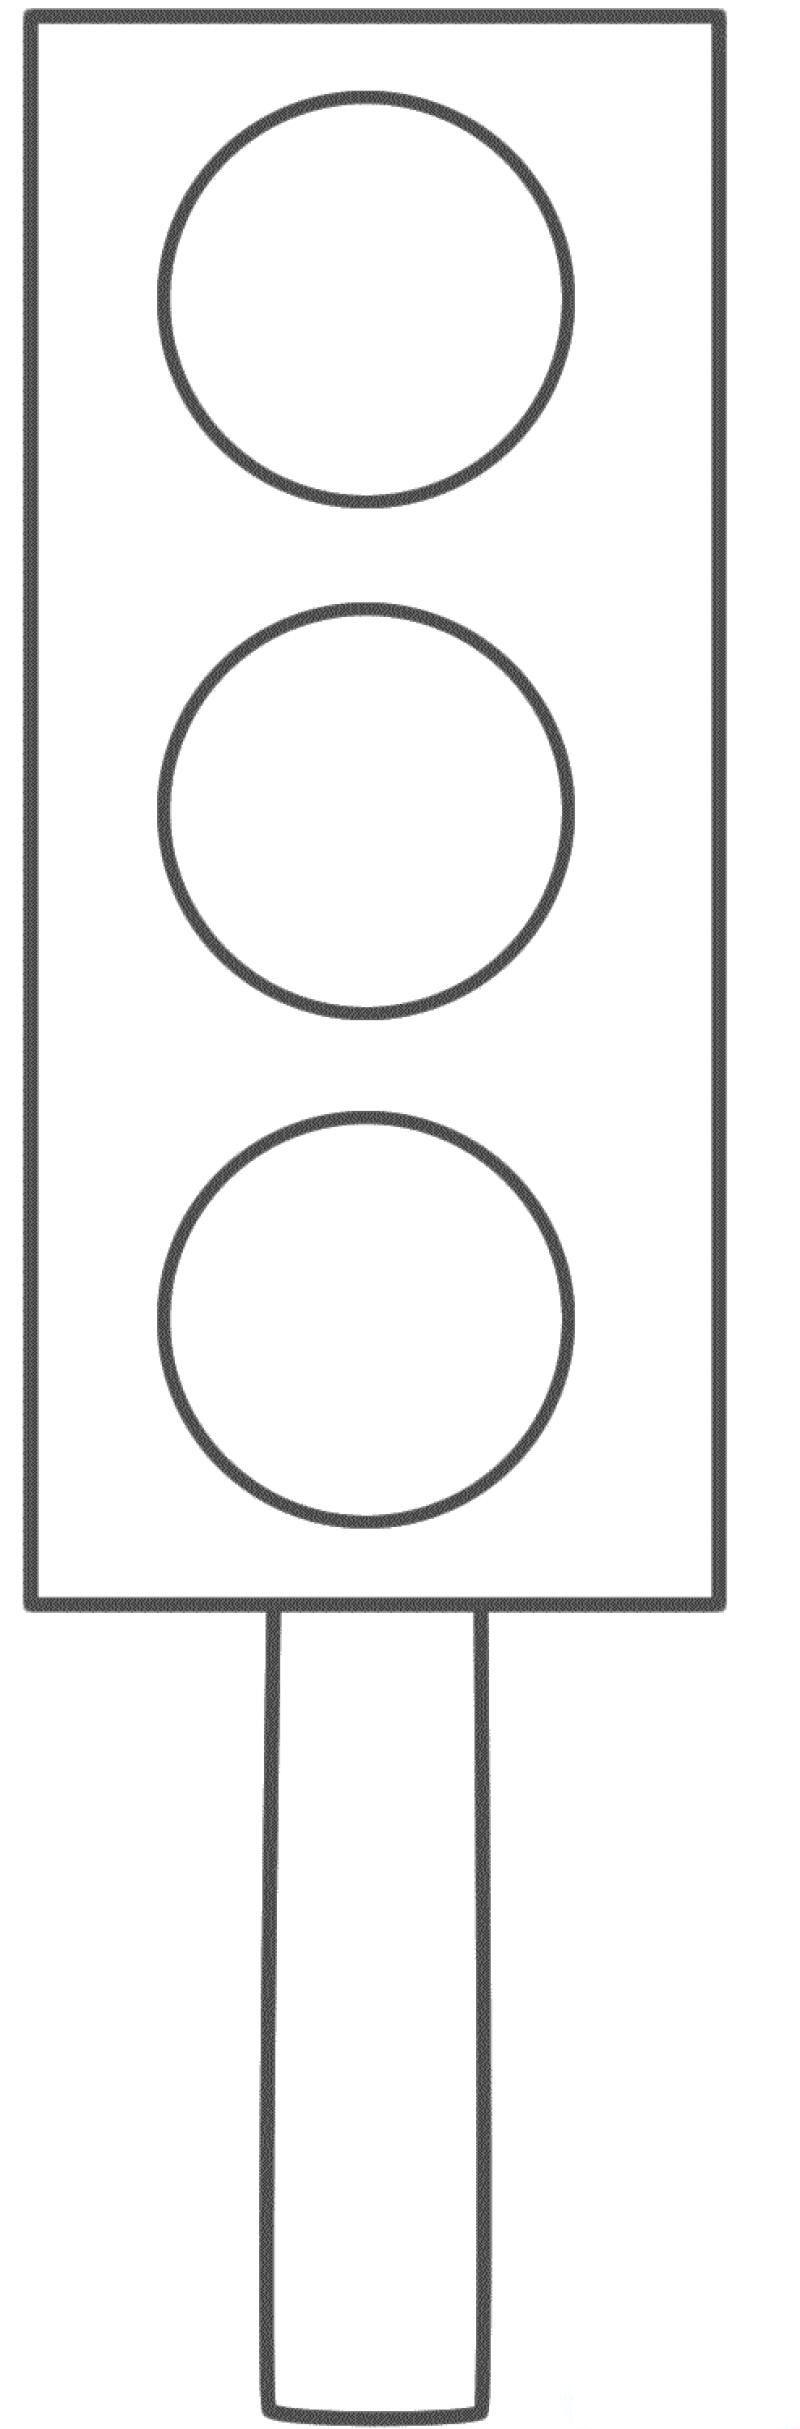 Traffic Light Craft With Pattern 2 Knutselen Thema Verkeer Stoplicht Vervoer Thema